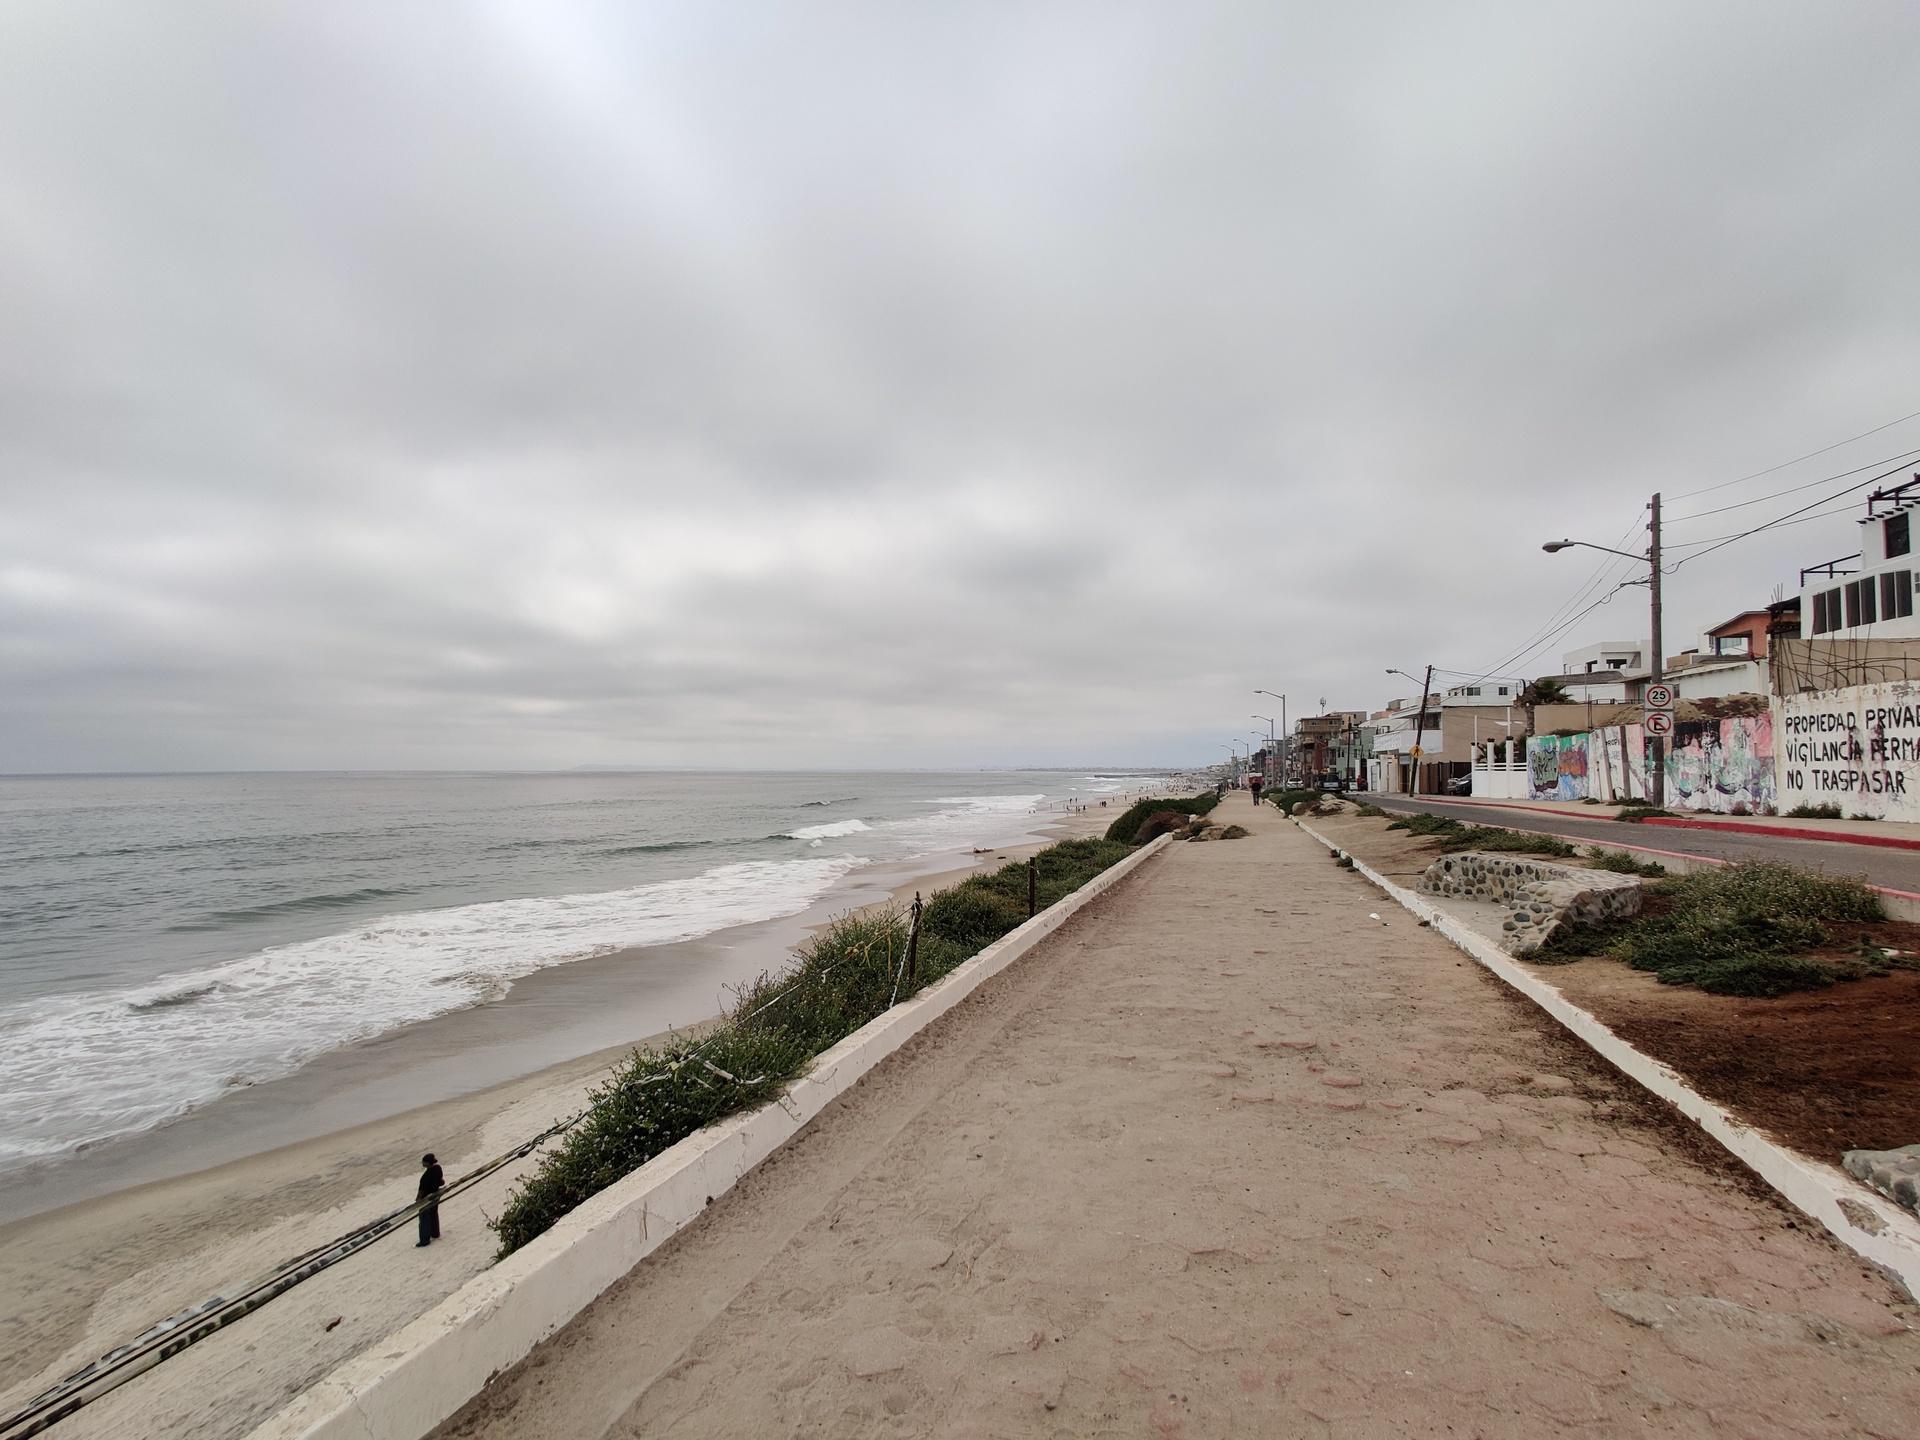 OnePlus 7 Pro landscape camera sample 4